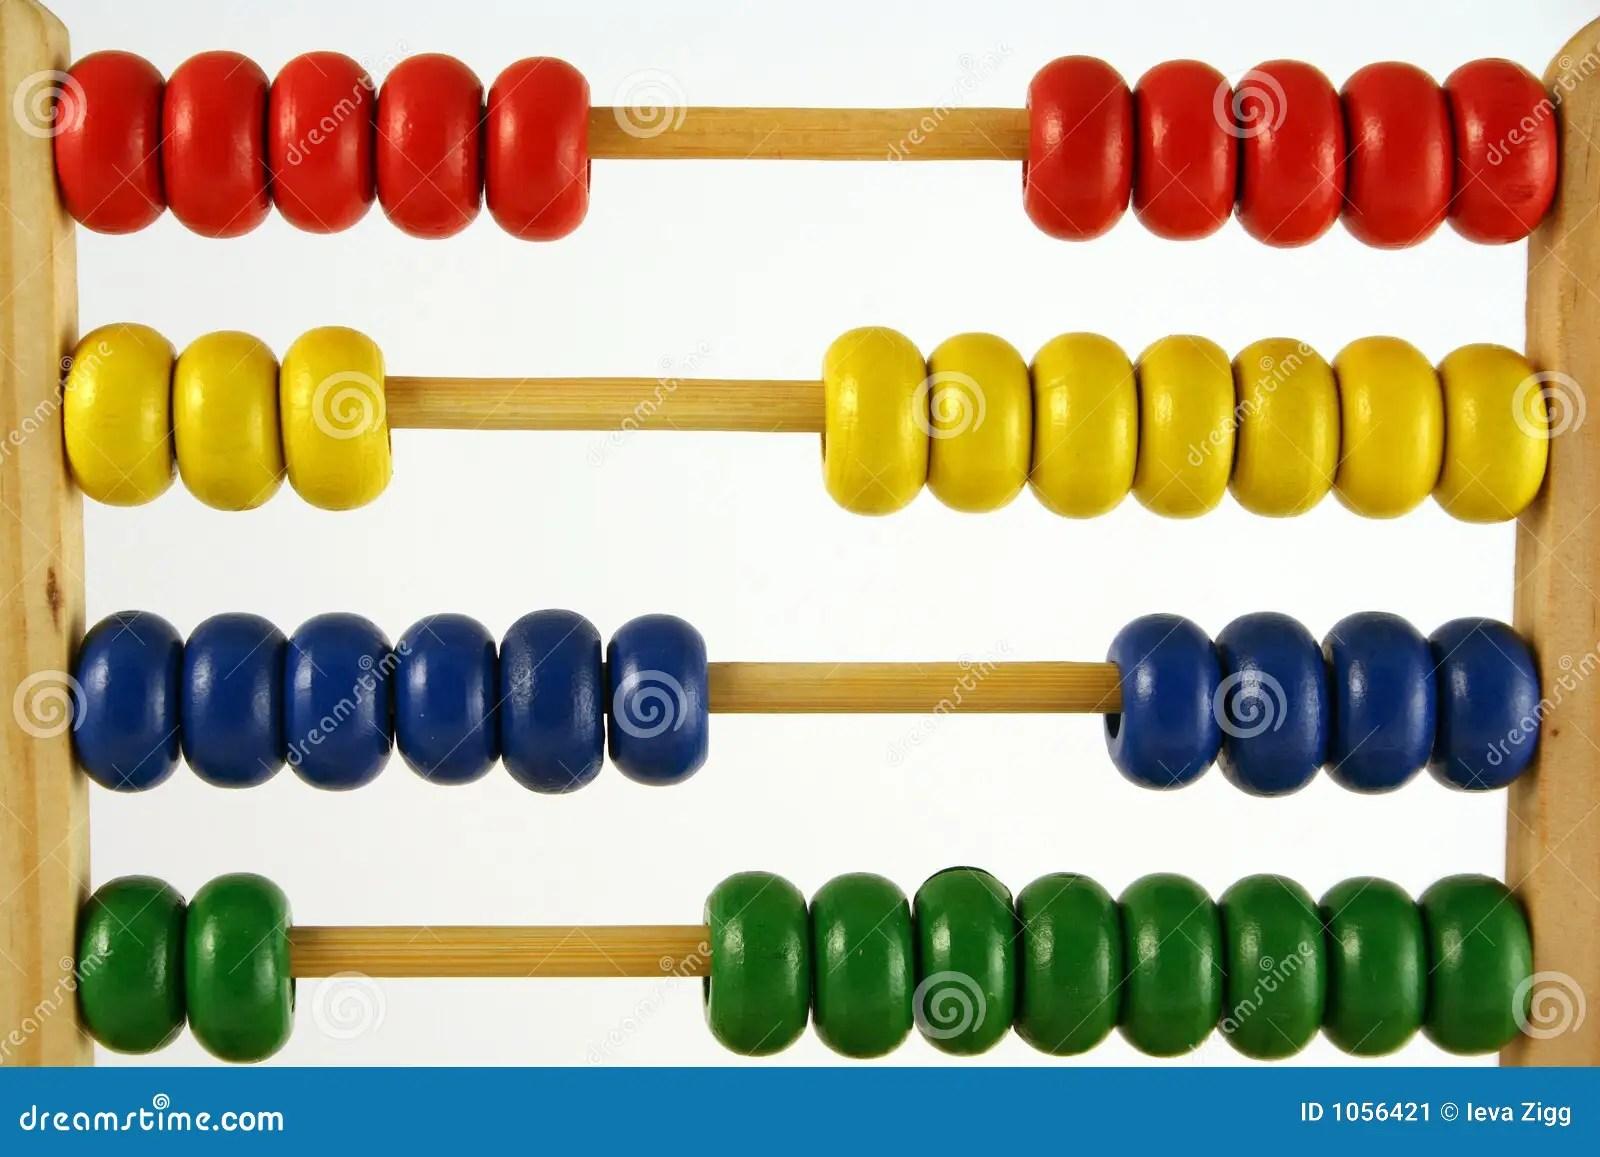 Abacus Horizontal Stock Image